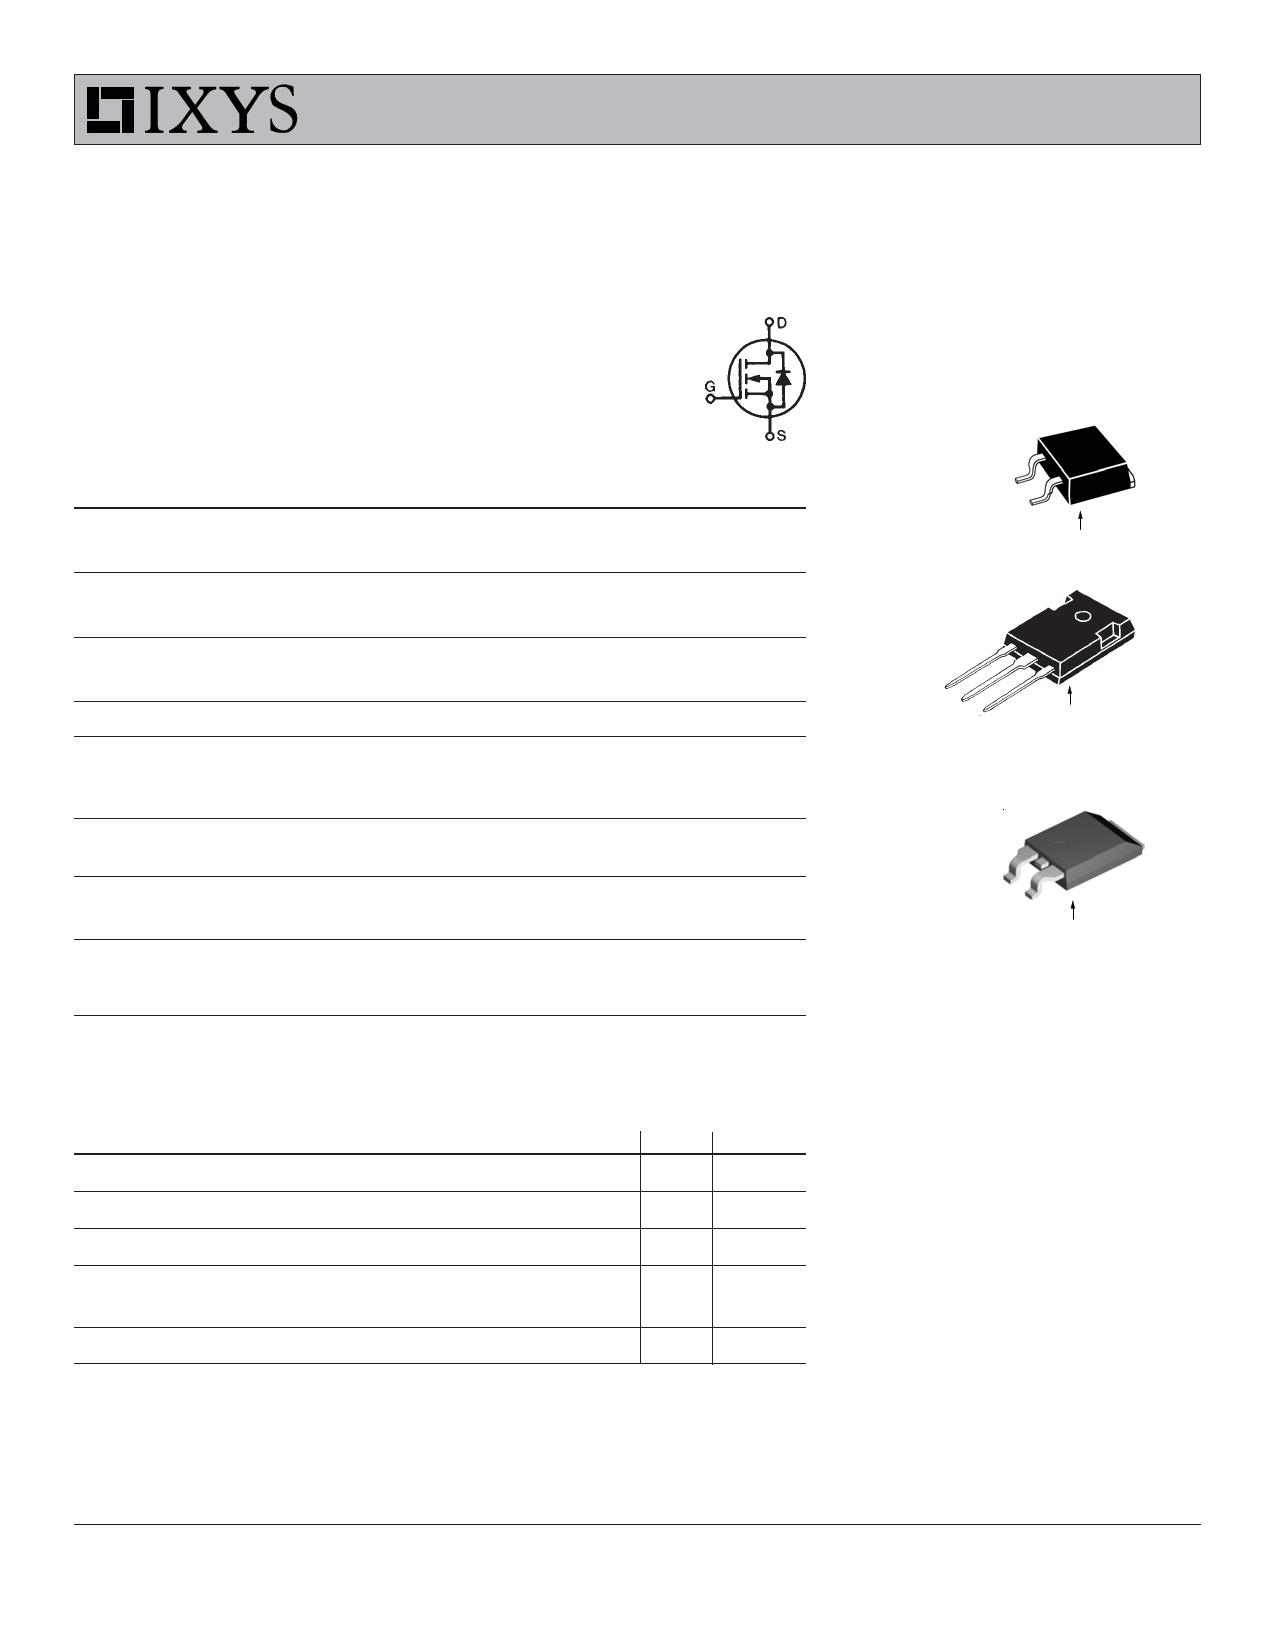 IXTV02N250S Datasheet, IXTV02N250S PDF,ピン配置, 機能